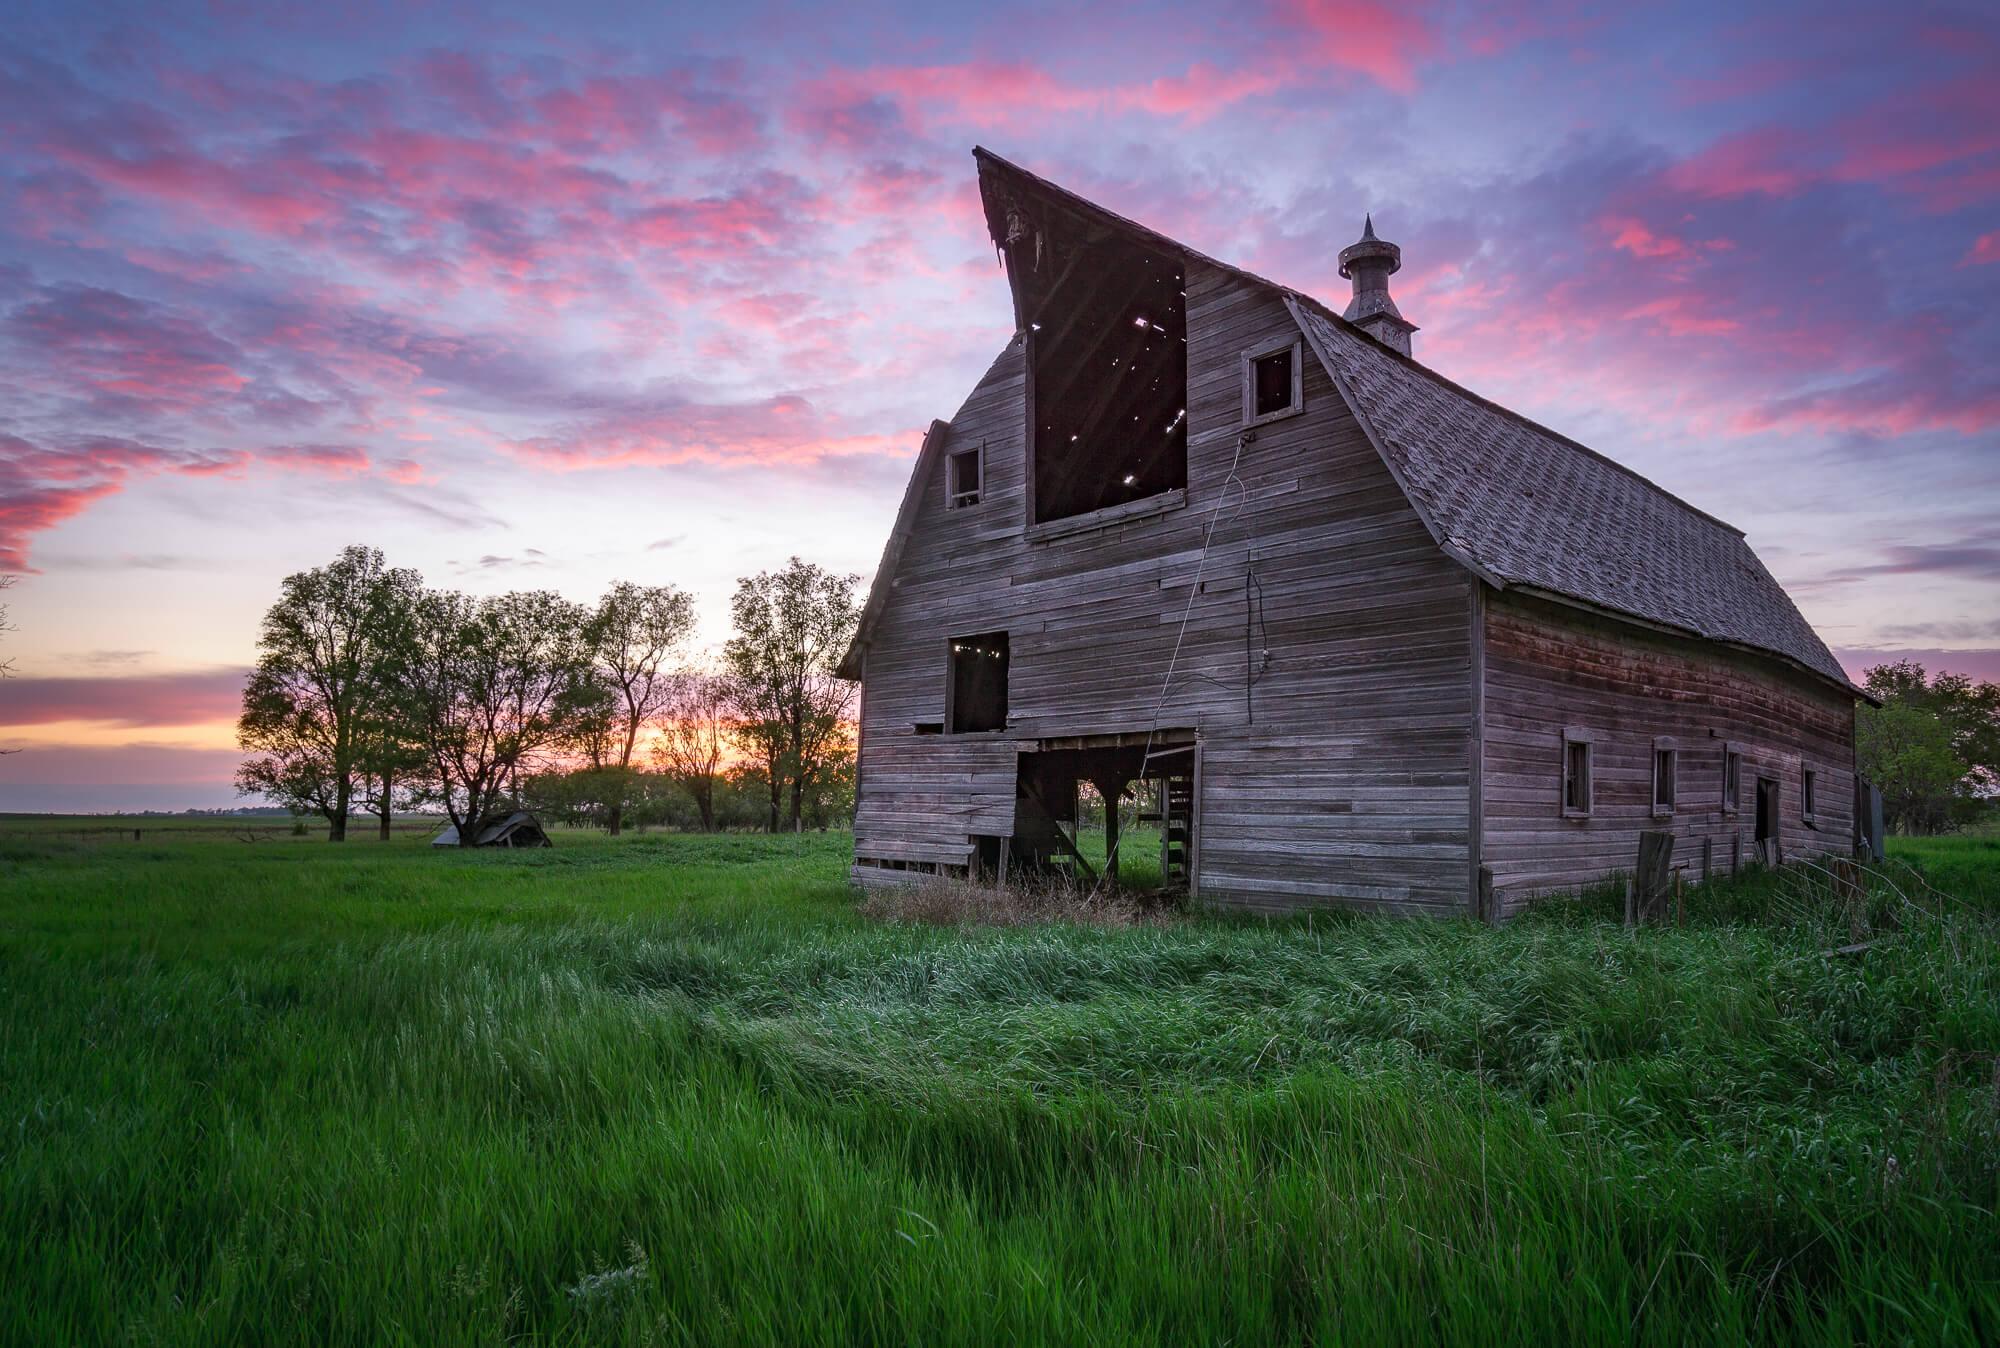 Sunset over an abandoned pole barn